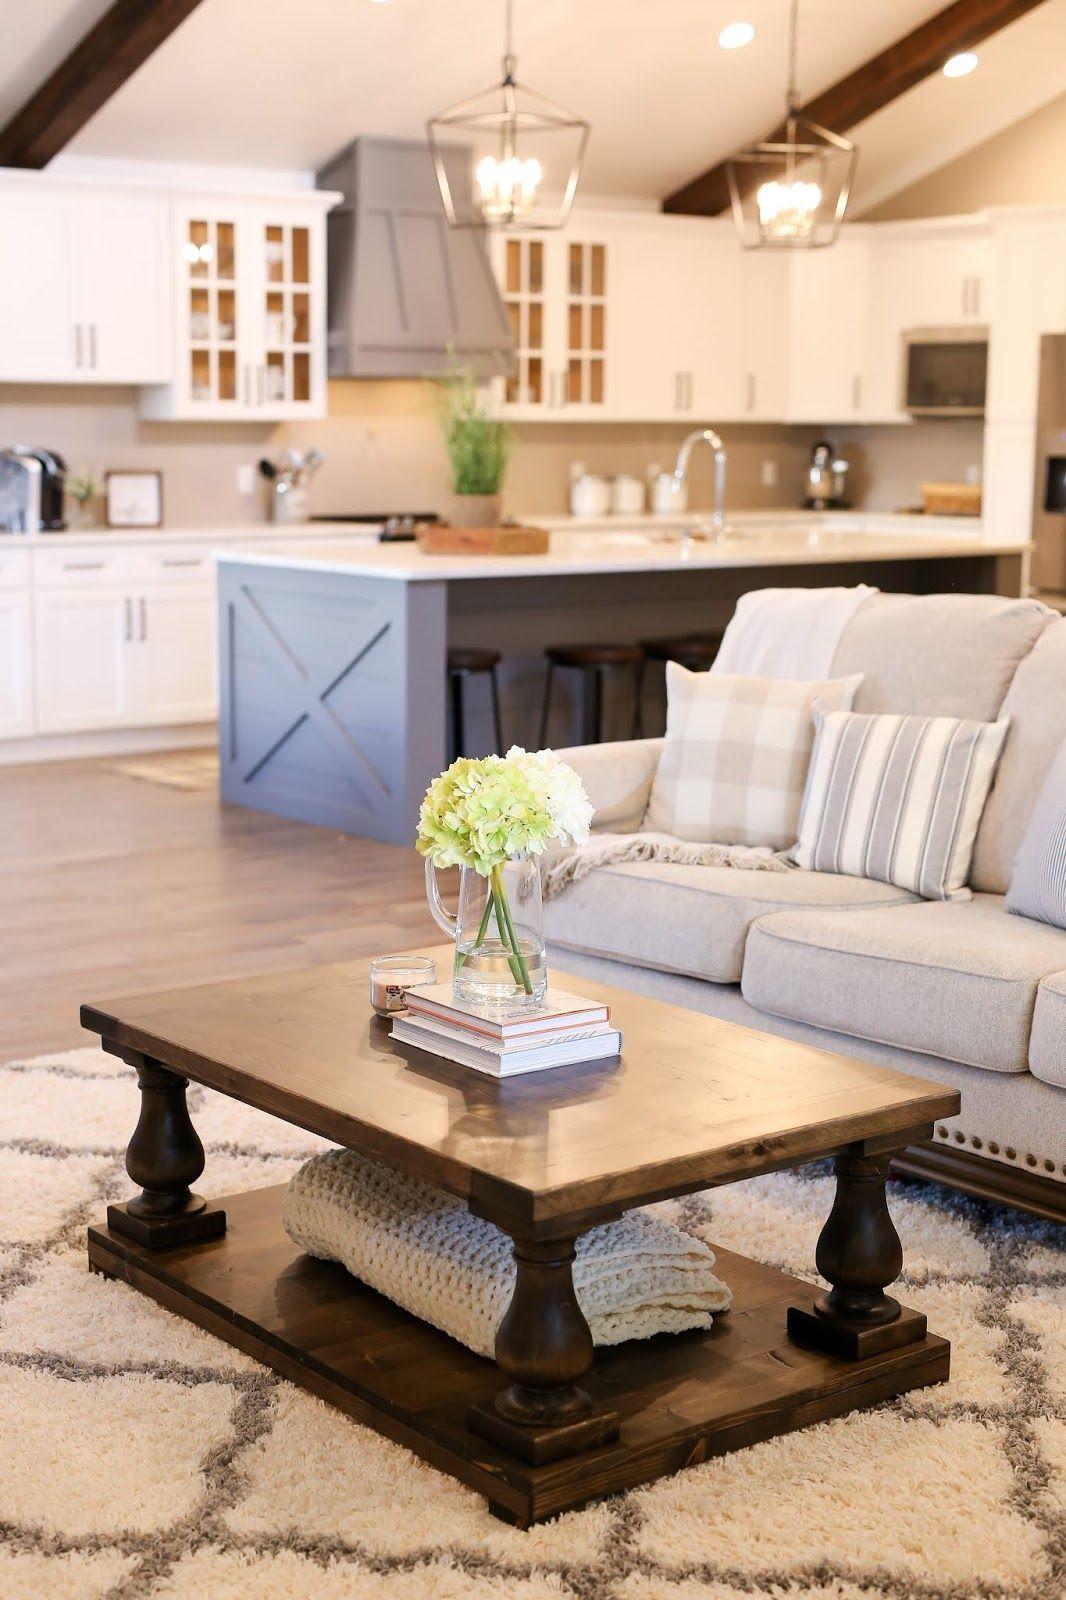 Balustrade coffee table diy plans wwwclassicallycourtney